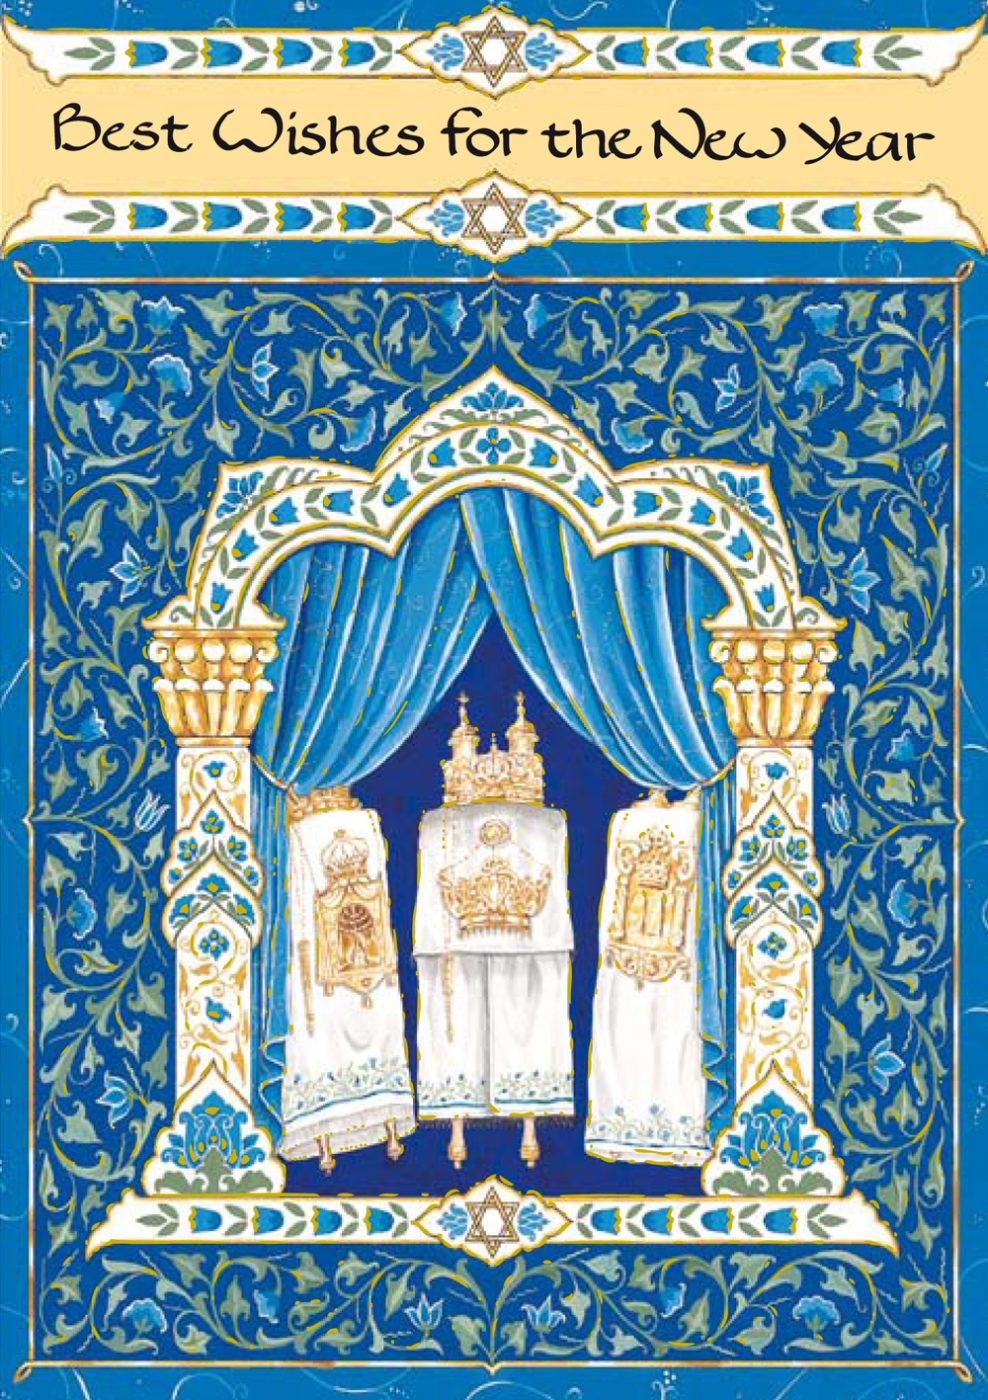 Jewish New Year Caspi Cards Amp Art